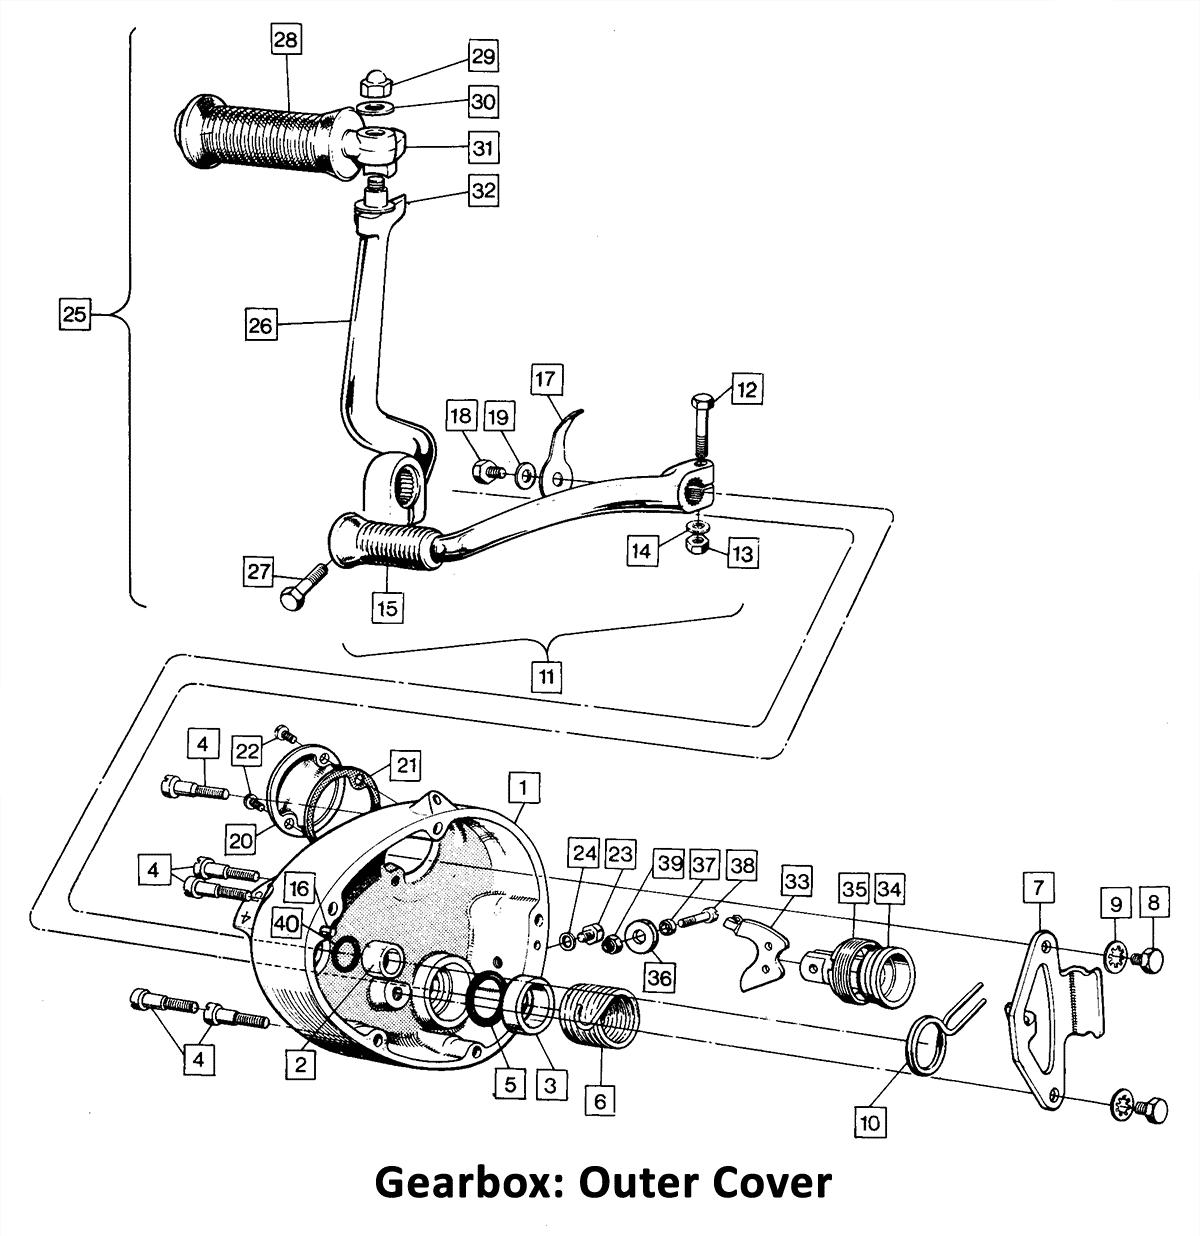 1973-74 Norton Commando 750 & 850 Gearbox: Outer Cover